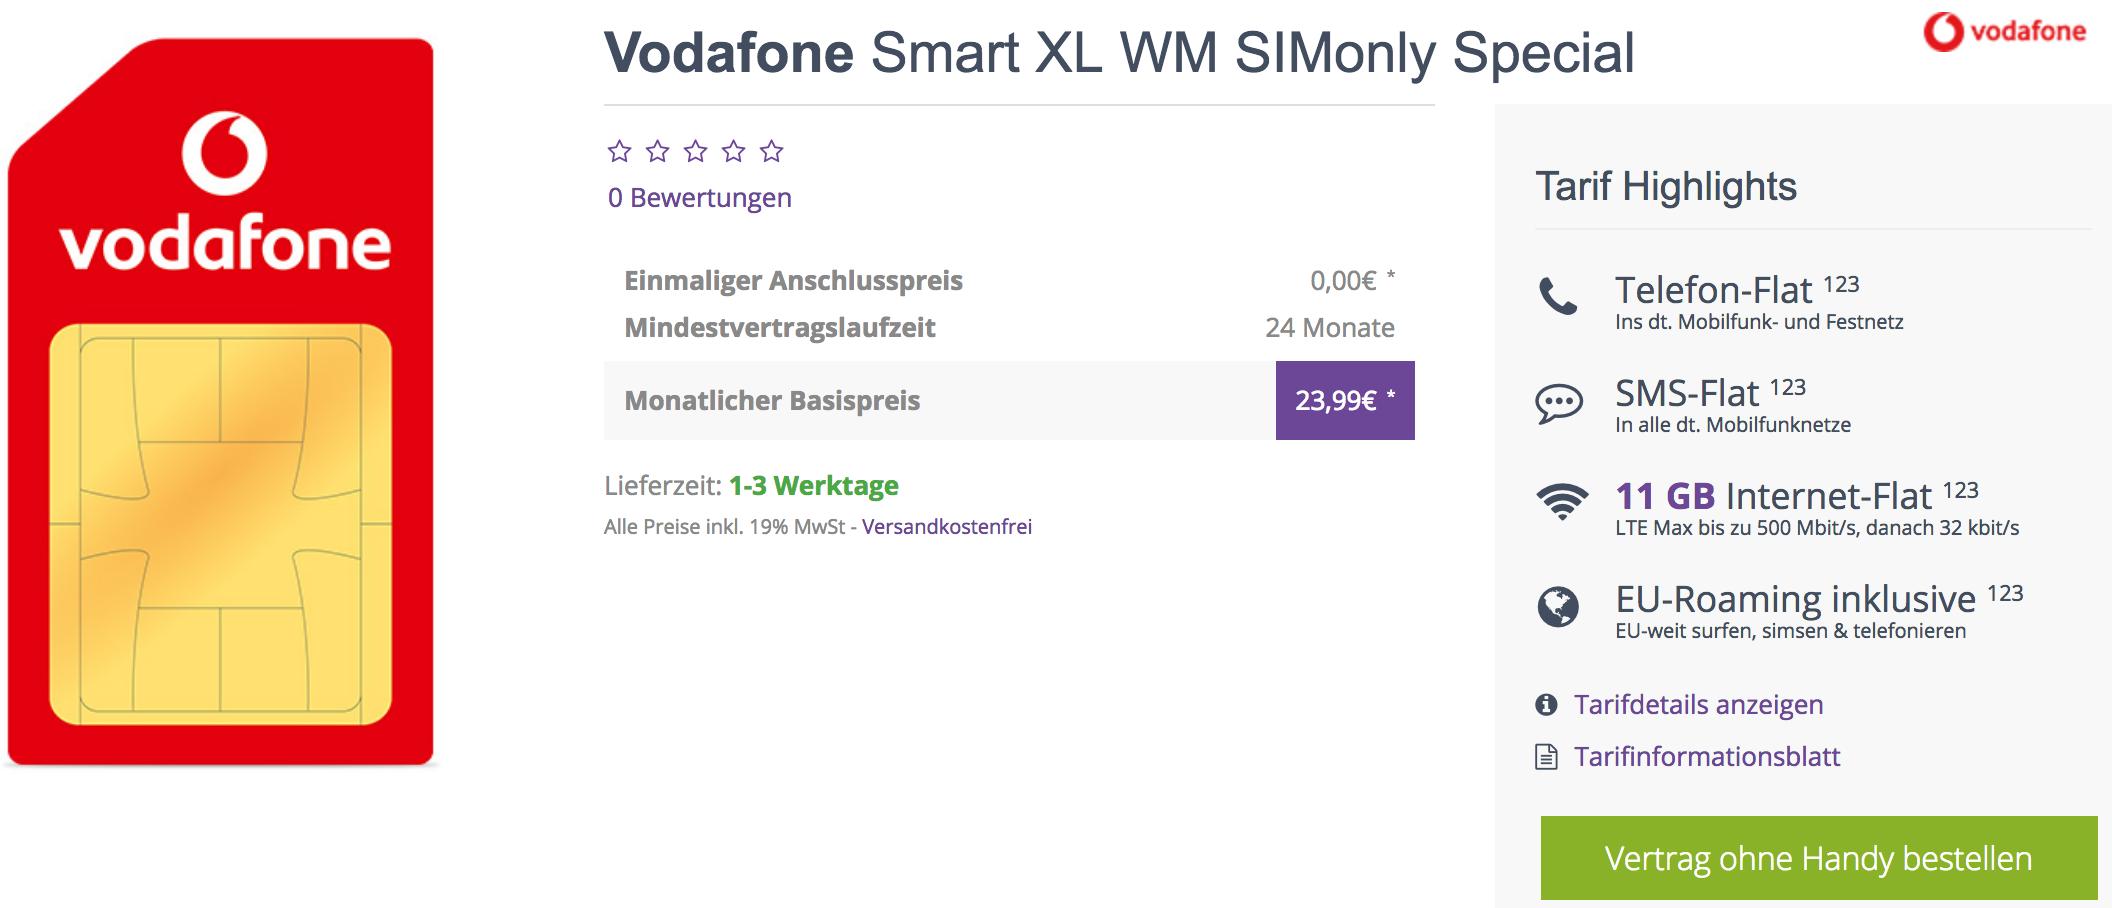 Vodafone Smart XL   11GB LTE + Allnet + EU Roaming für 19,99€ im Monat